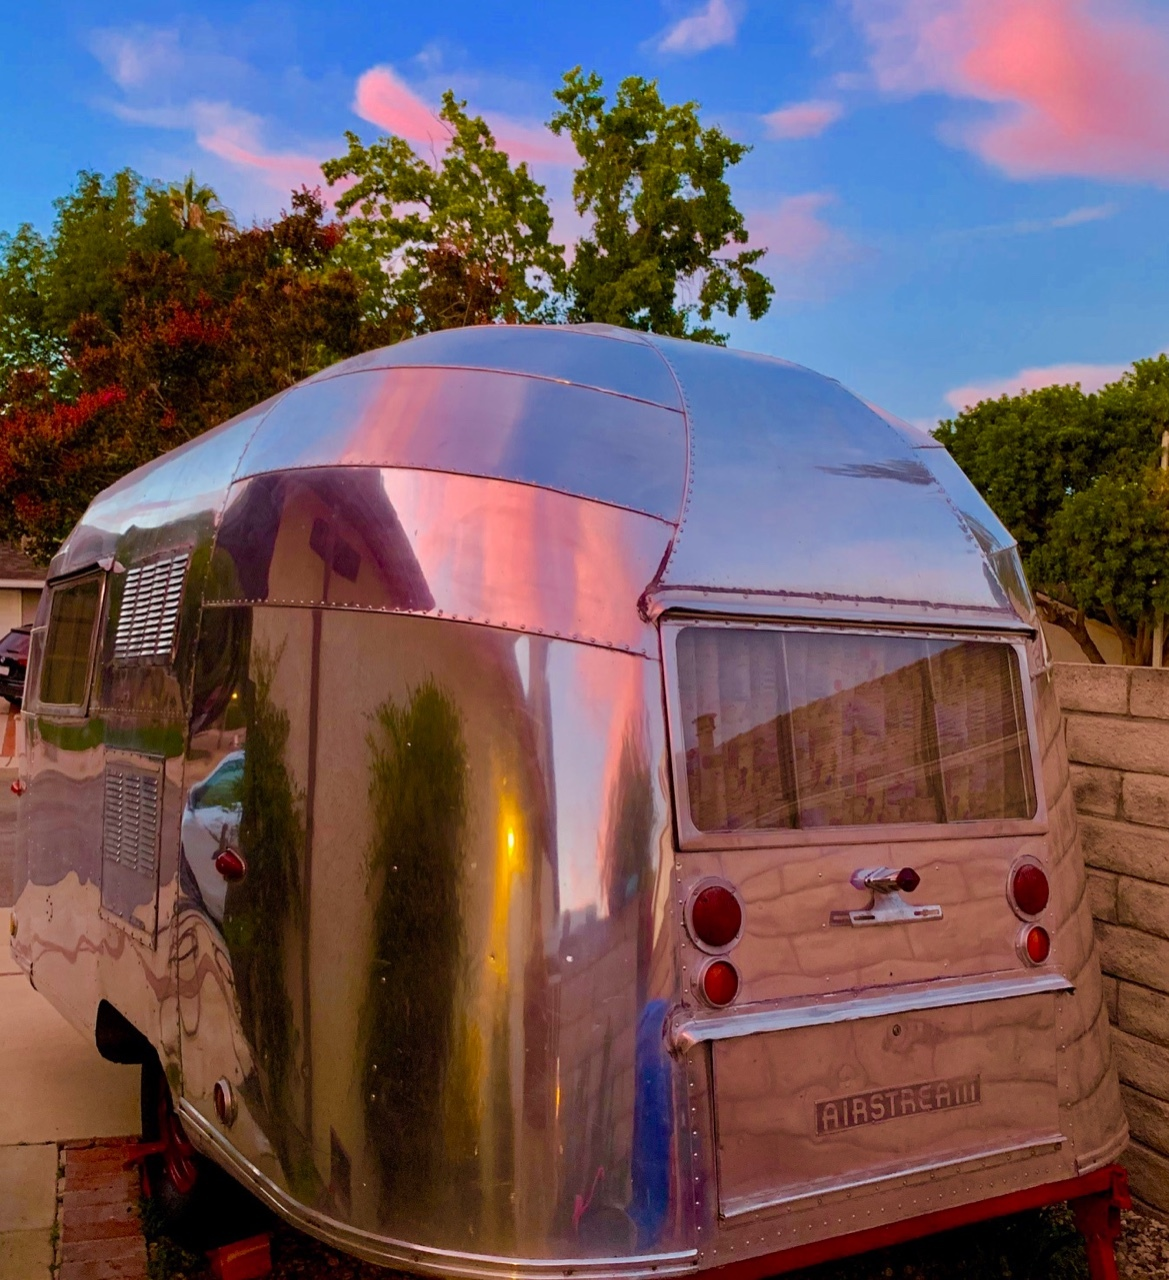 California - Airstream For Sale - Airstream RVs - RV Trader